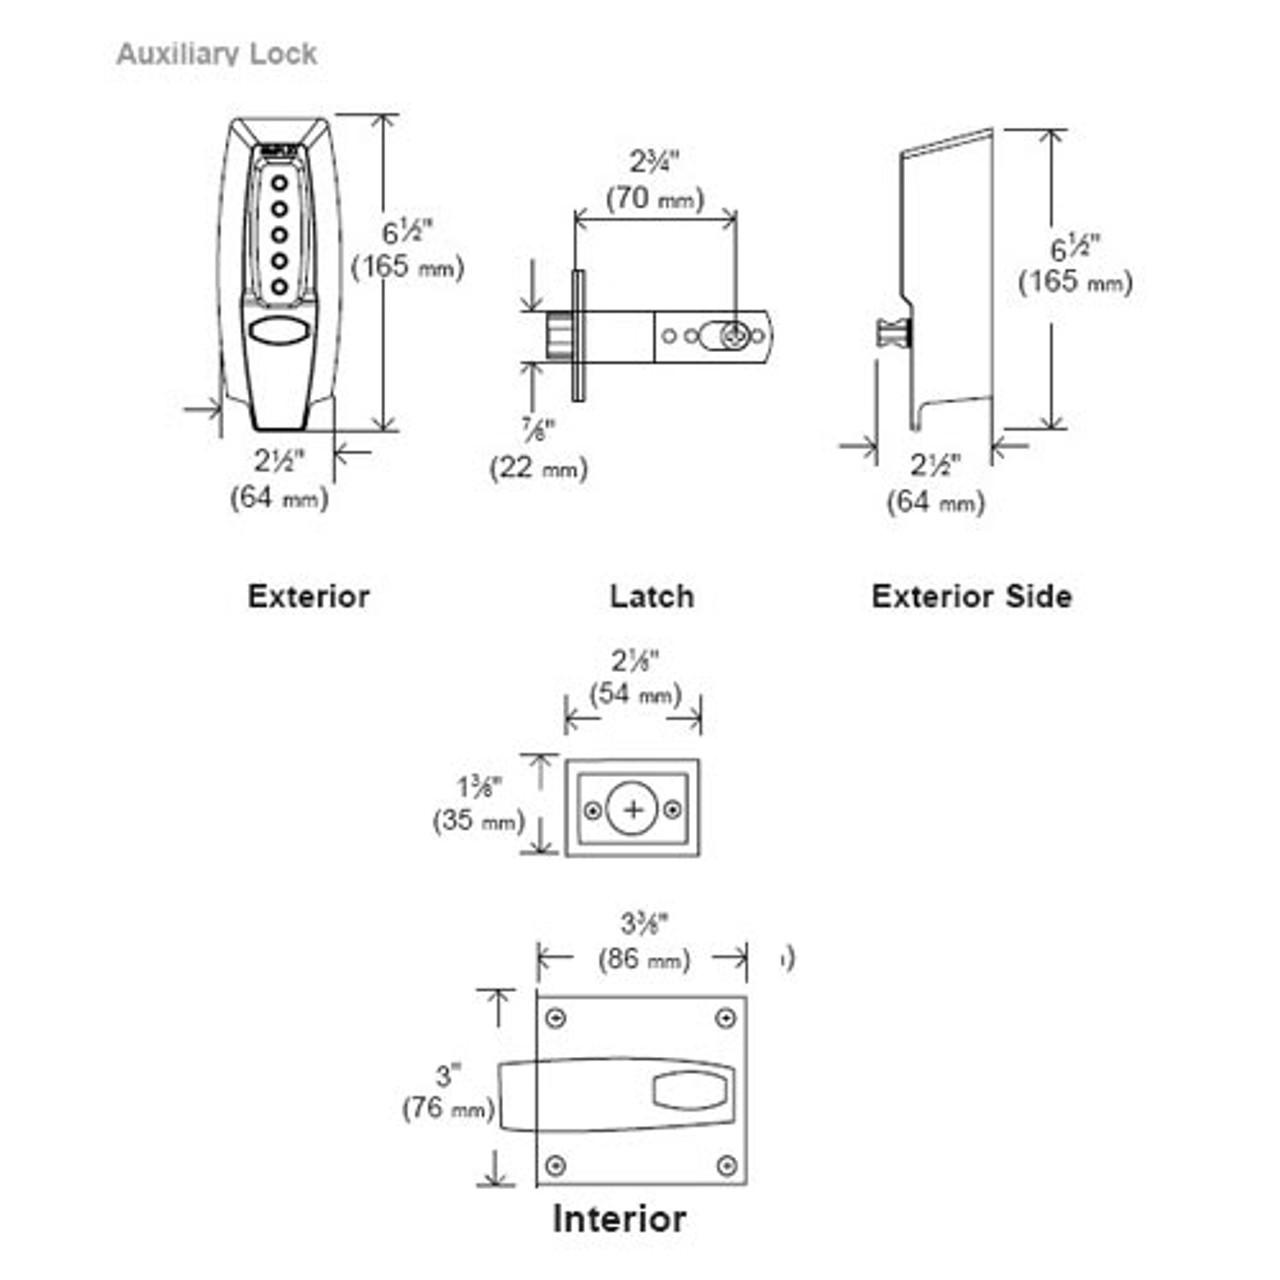 small resolution of 7106 19 41 simplex pushbutton keyless latch lock in black lock simplex lock diagram source